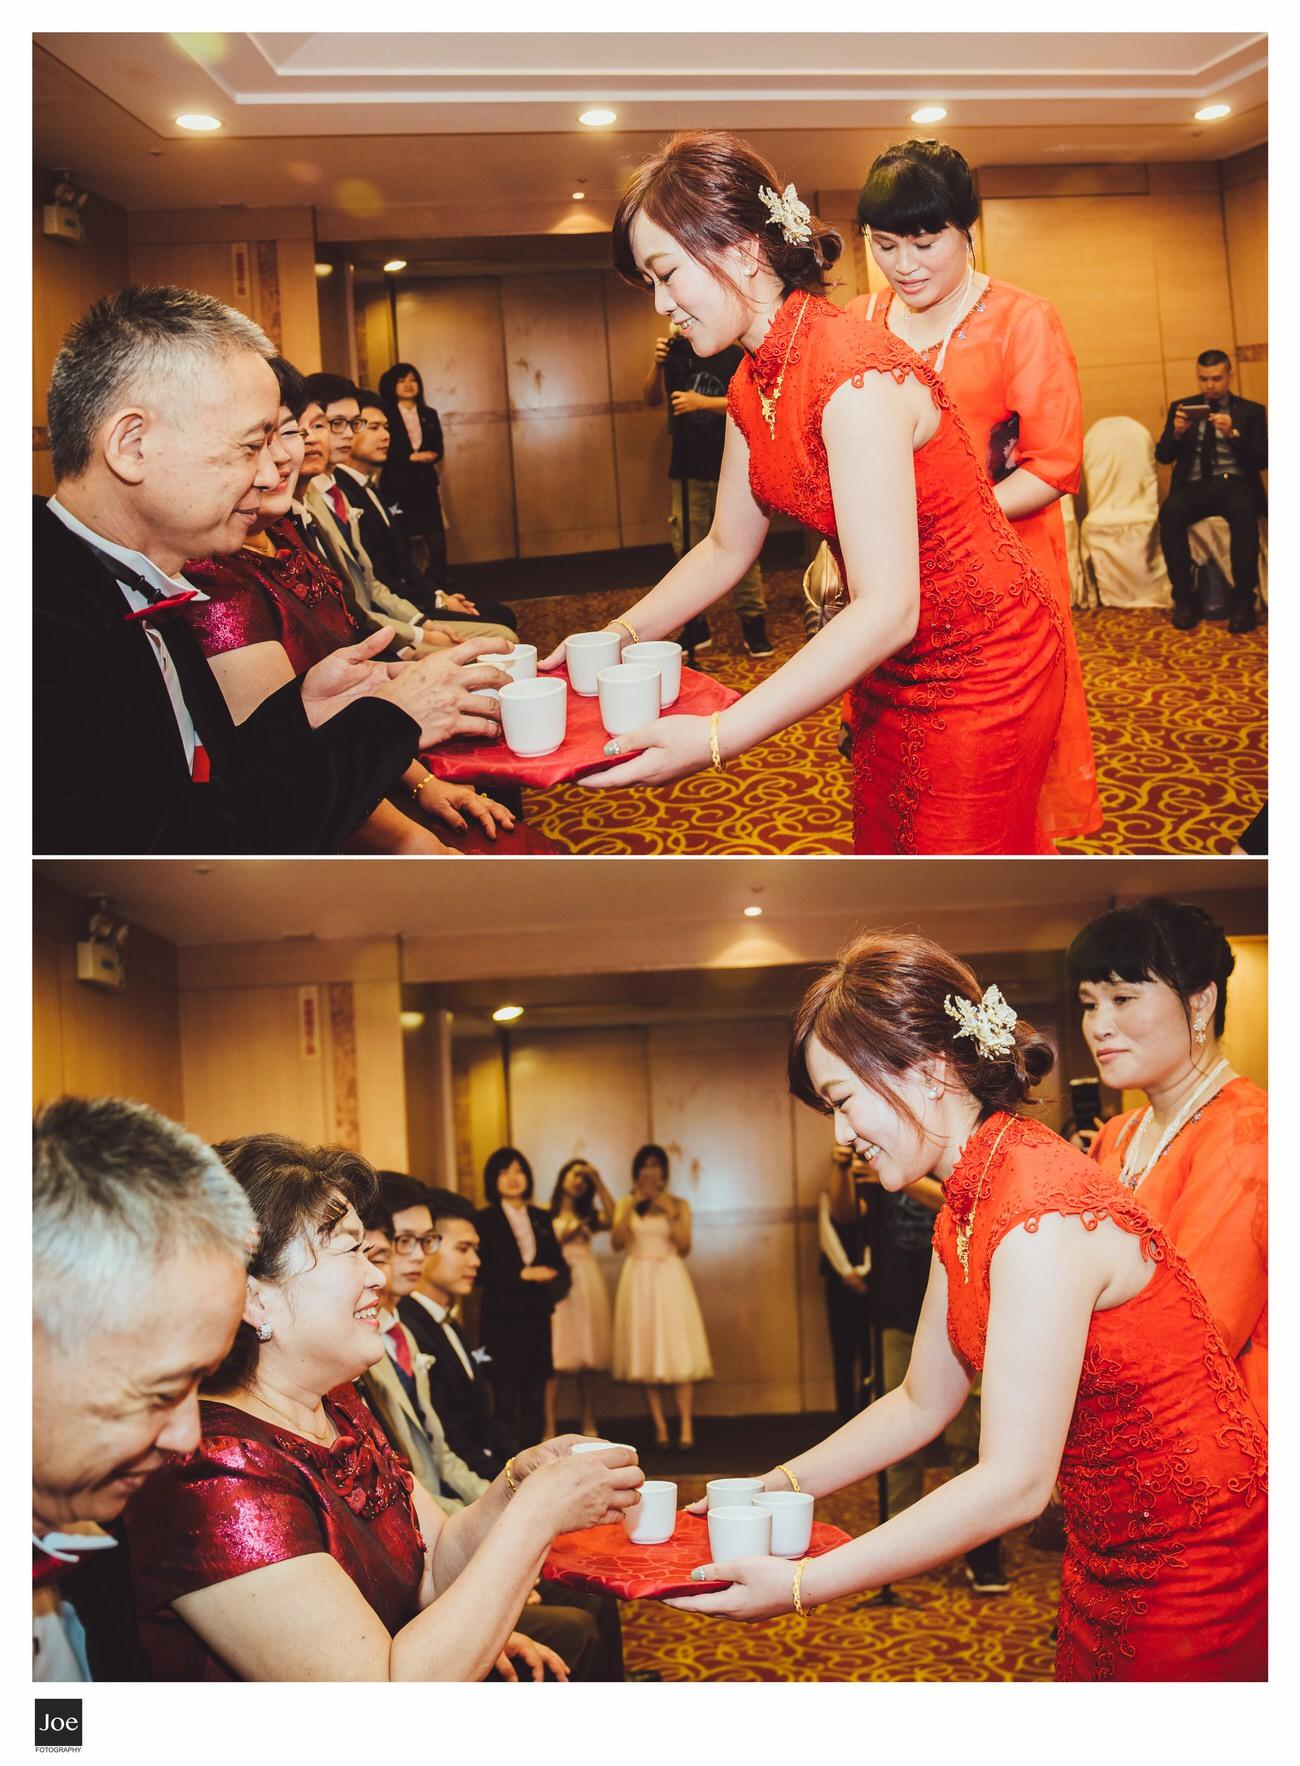 sunworld-dynasty-hotel-taipei-wedding-photo-joe-fotography-angel-jay-013.jpg